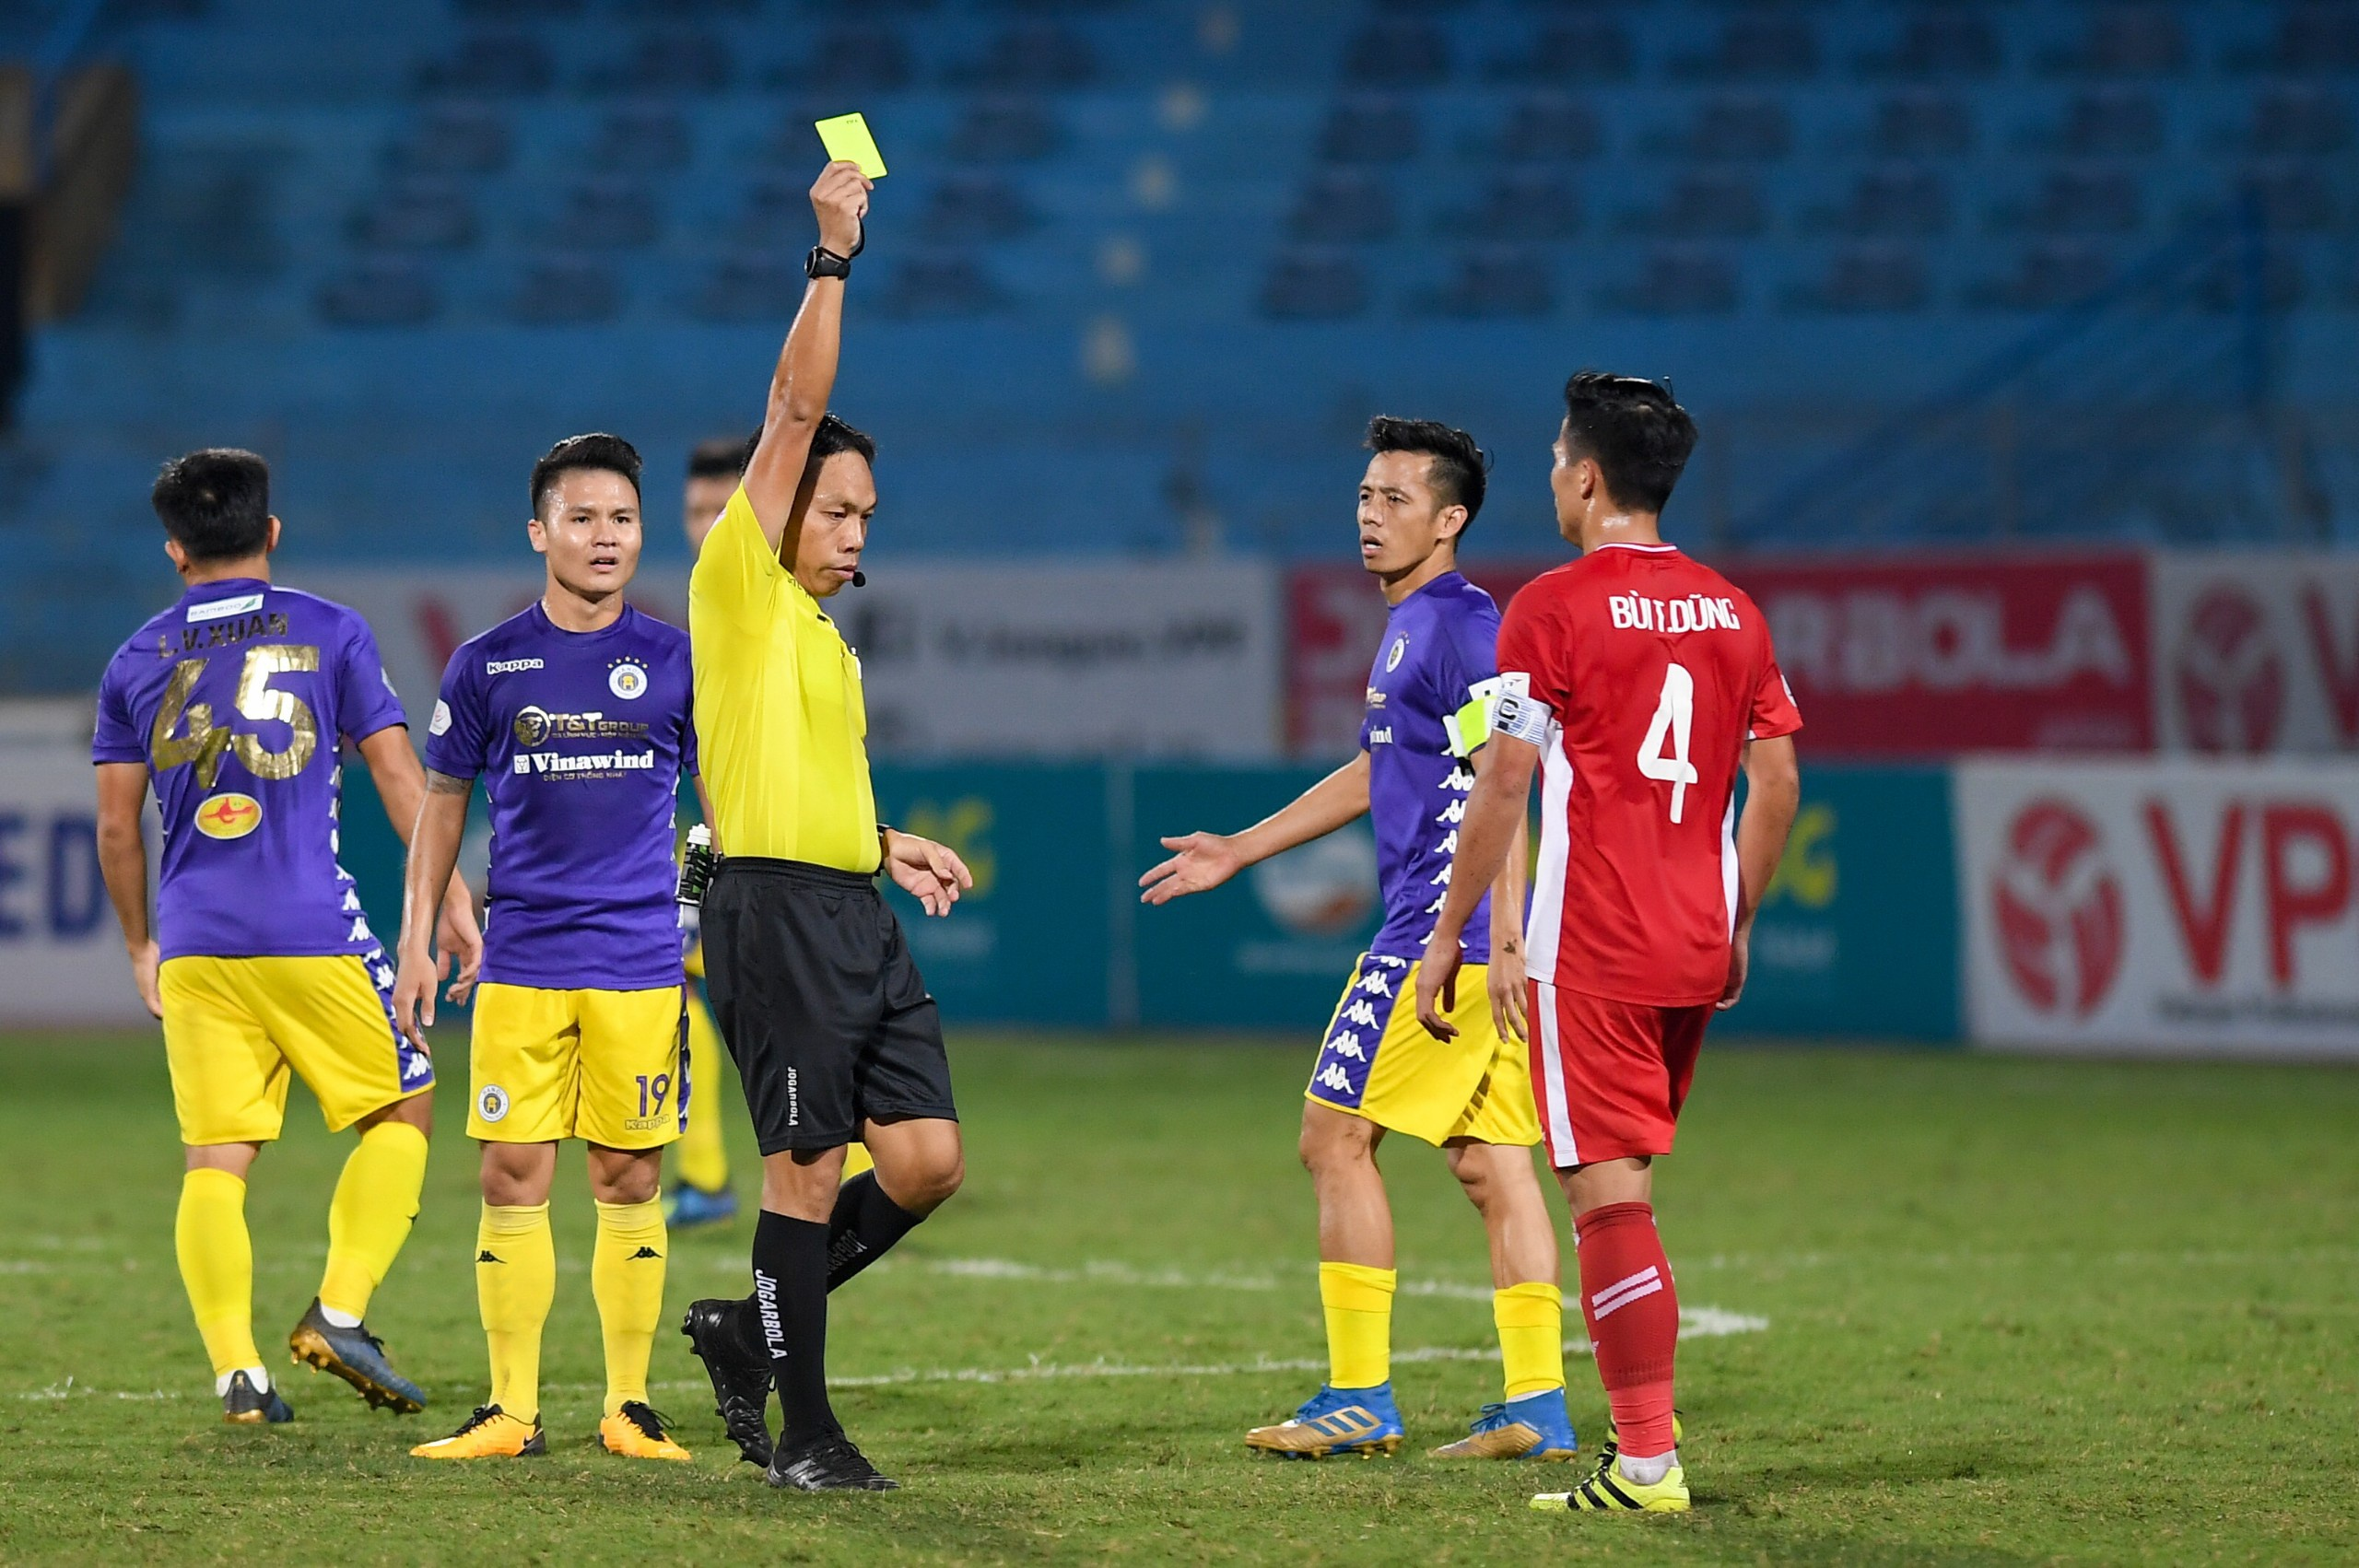 CLB Ha Noi vs Viettel anh 15